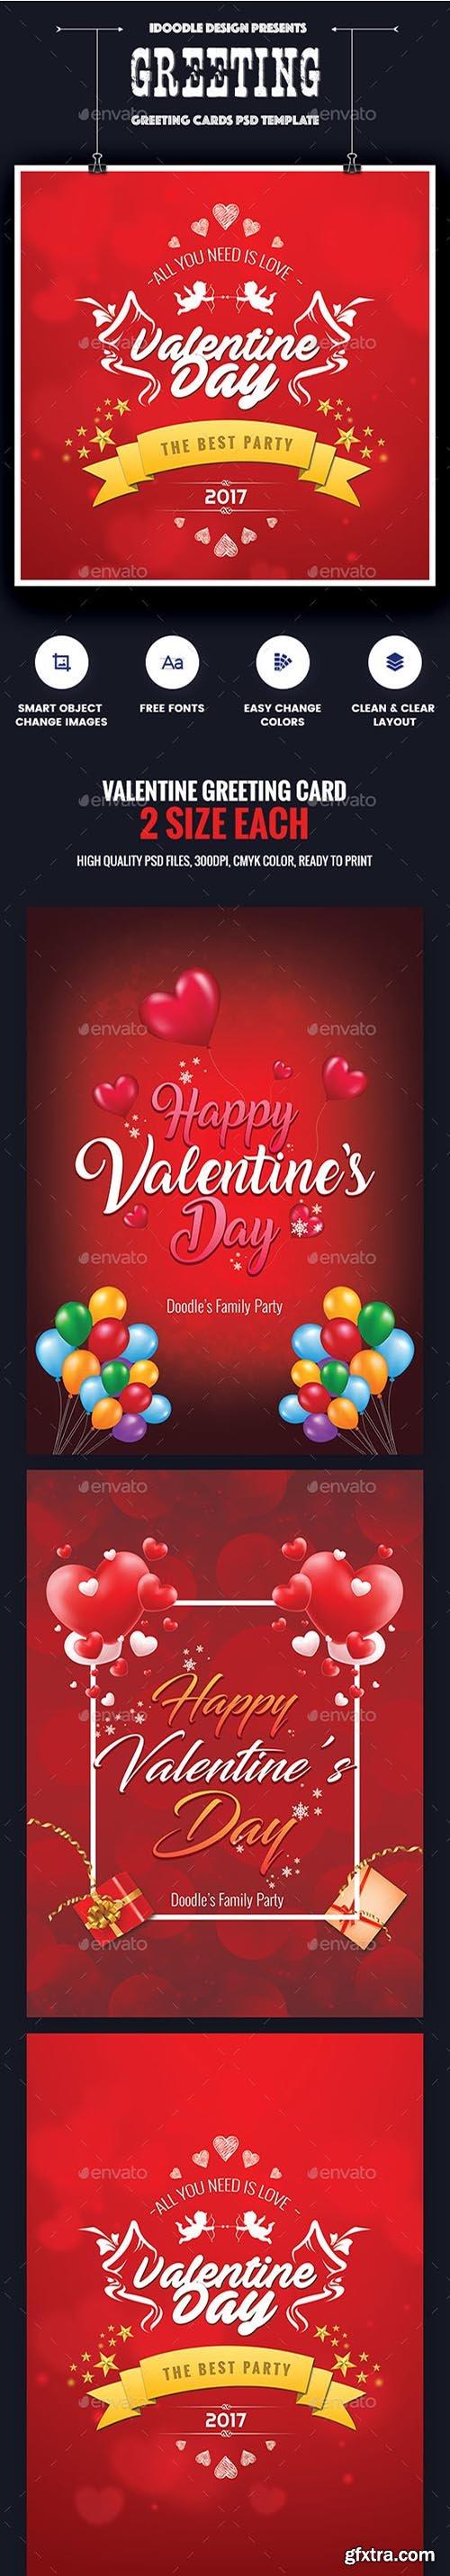 Valentine Greeting Card - 06 PSD [02 Size Each - 7x5 & 5x7] 19261223